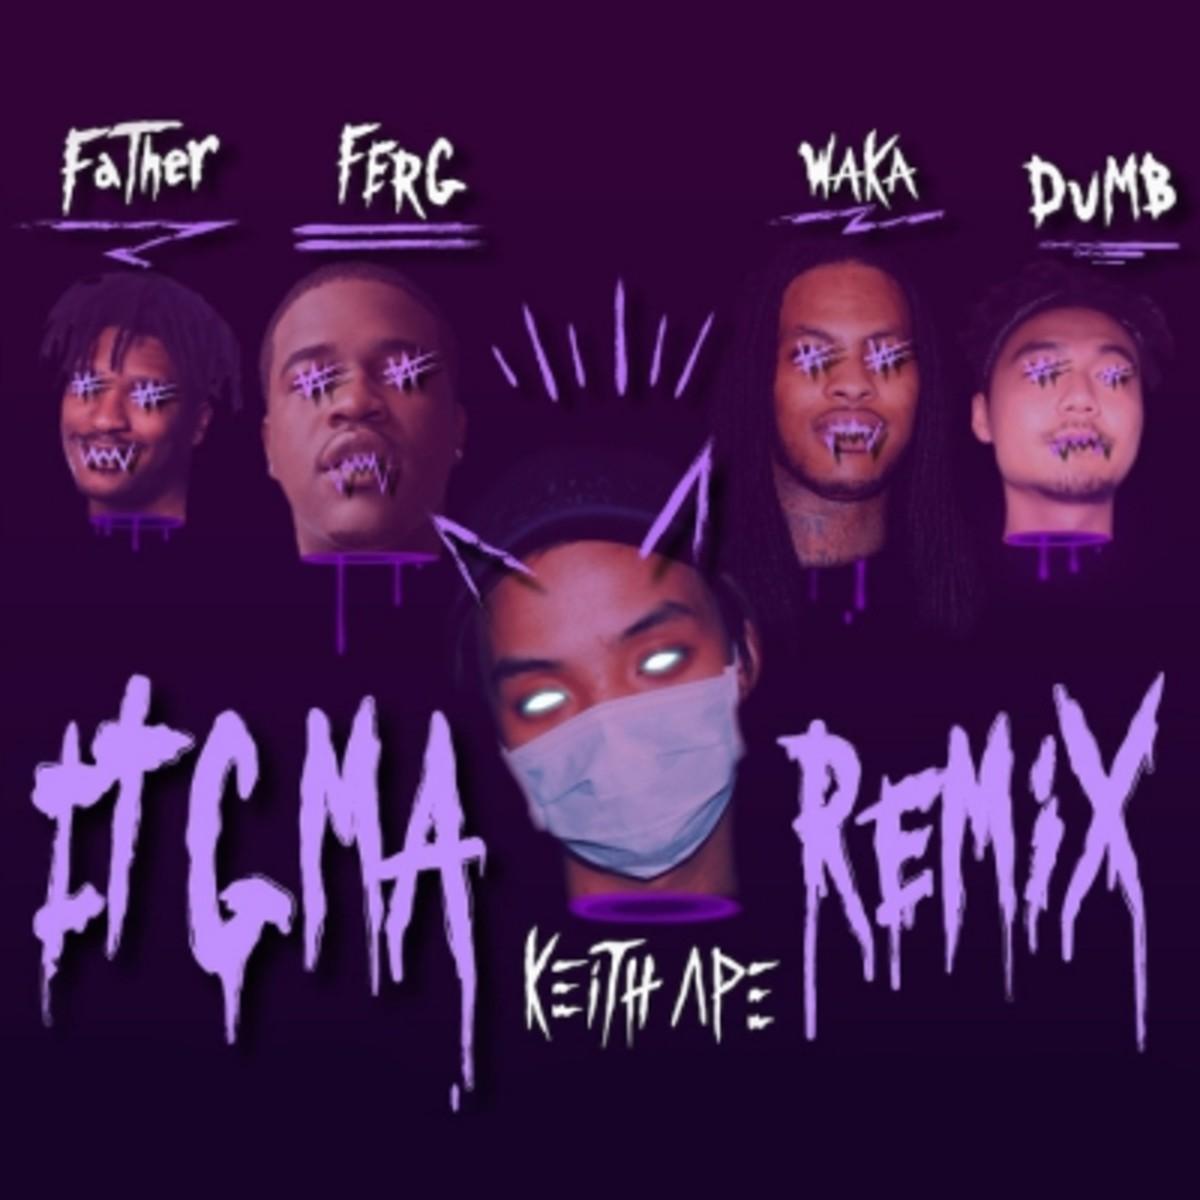 keith-ape-it-g-ma-remix.jpg